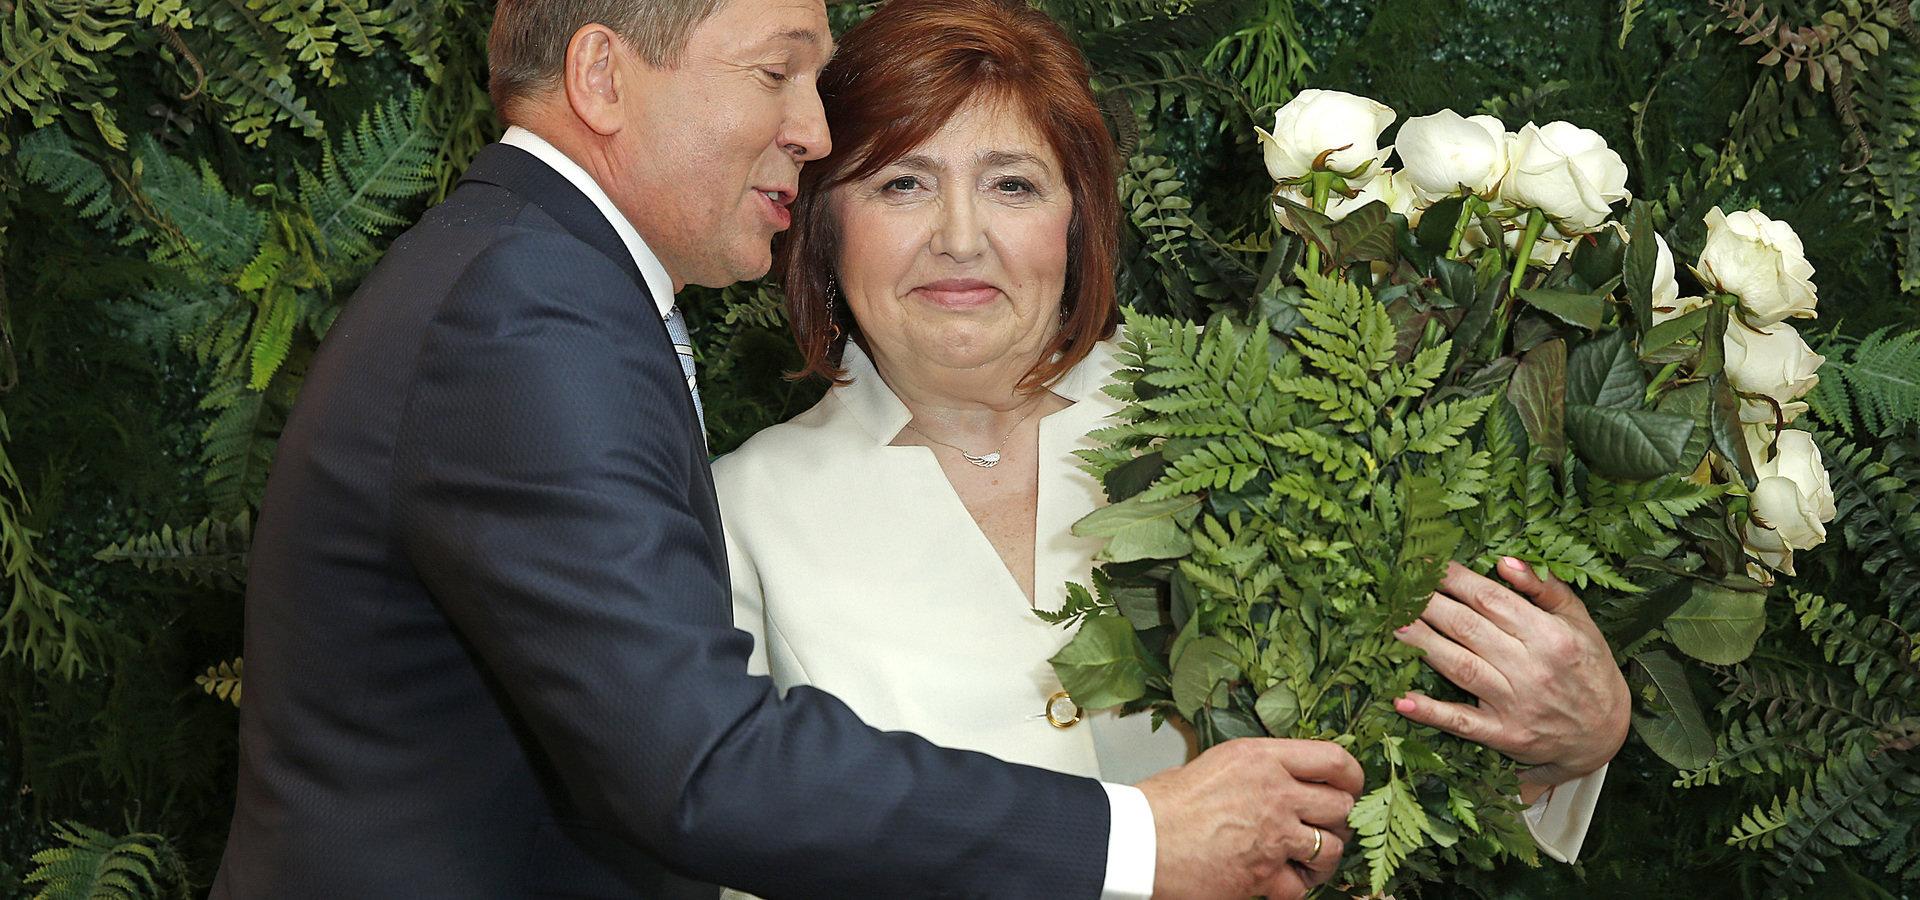 Woman of the Year award for Lidia Niedźwiedzka-Owsiak